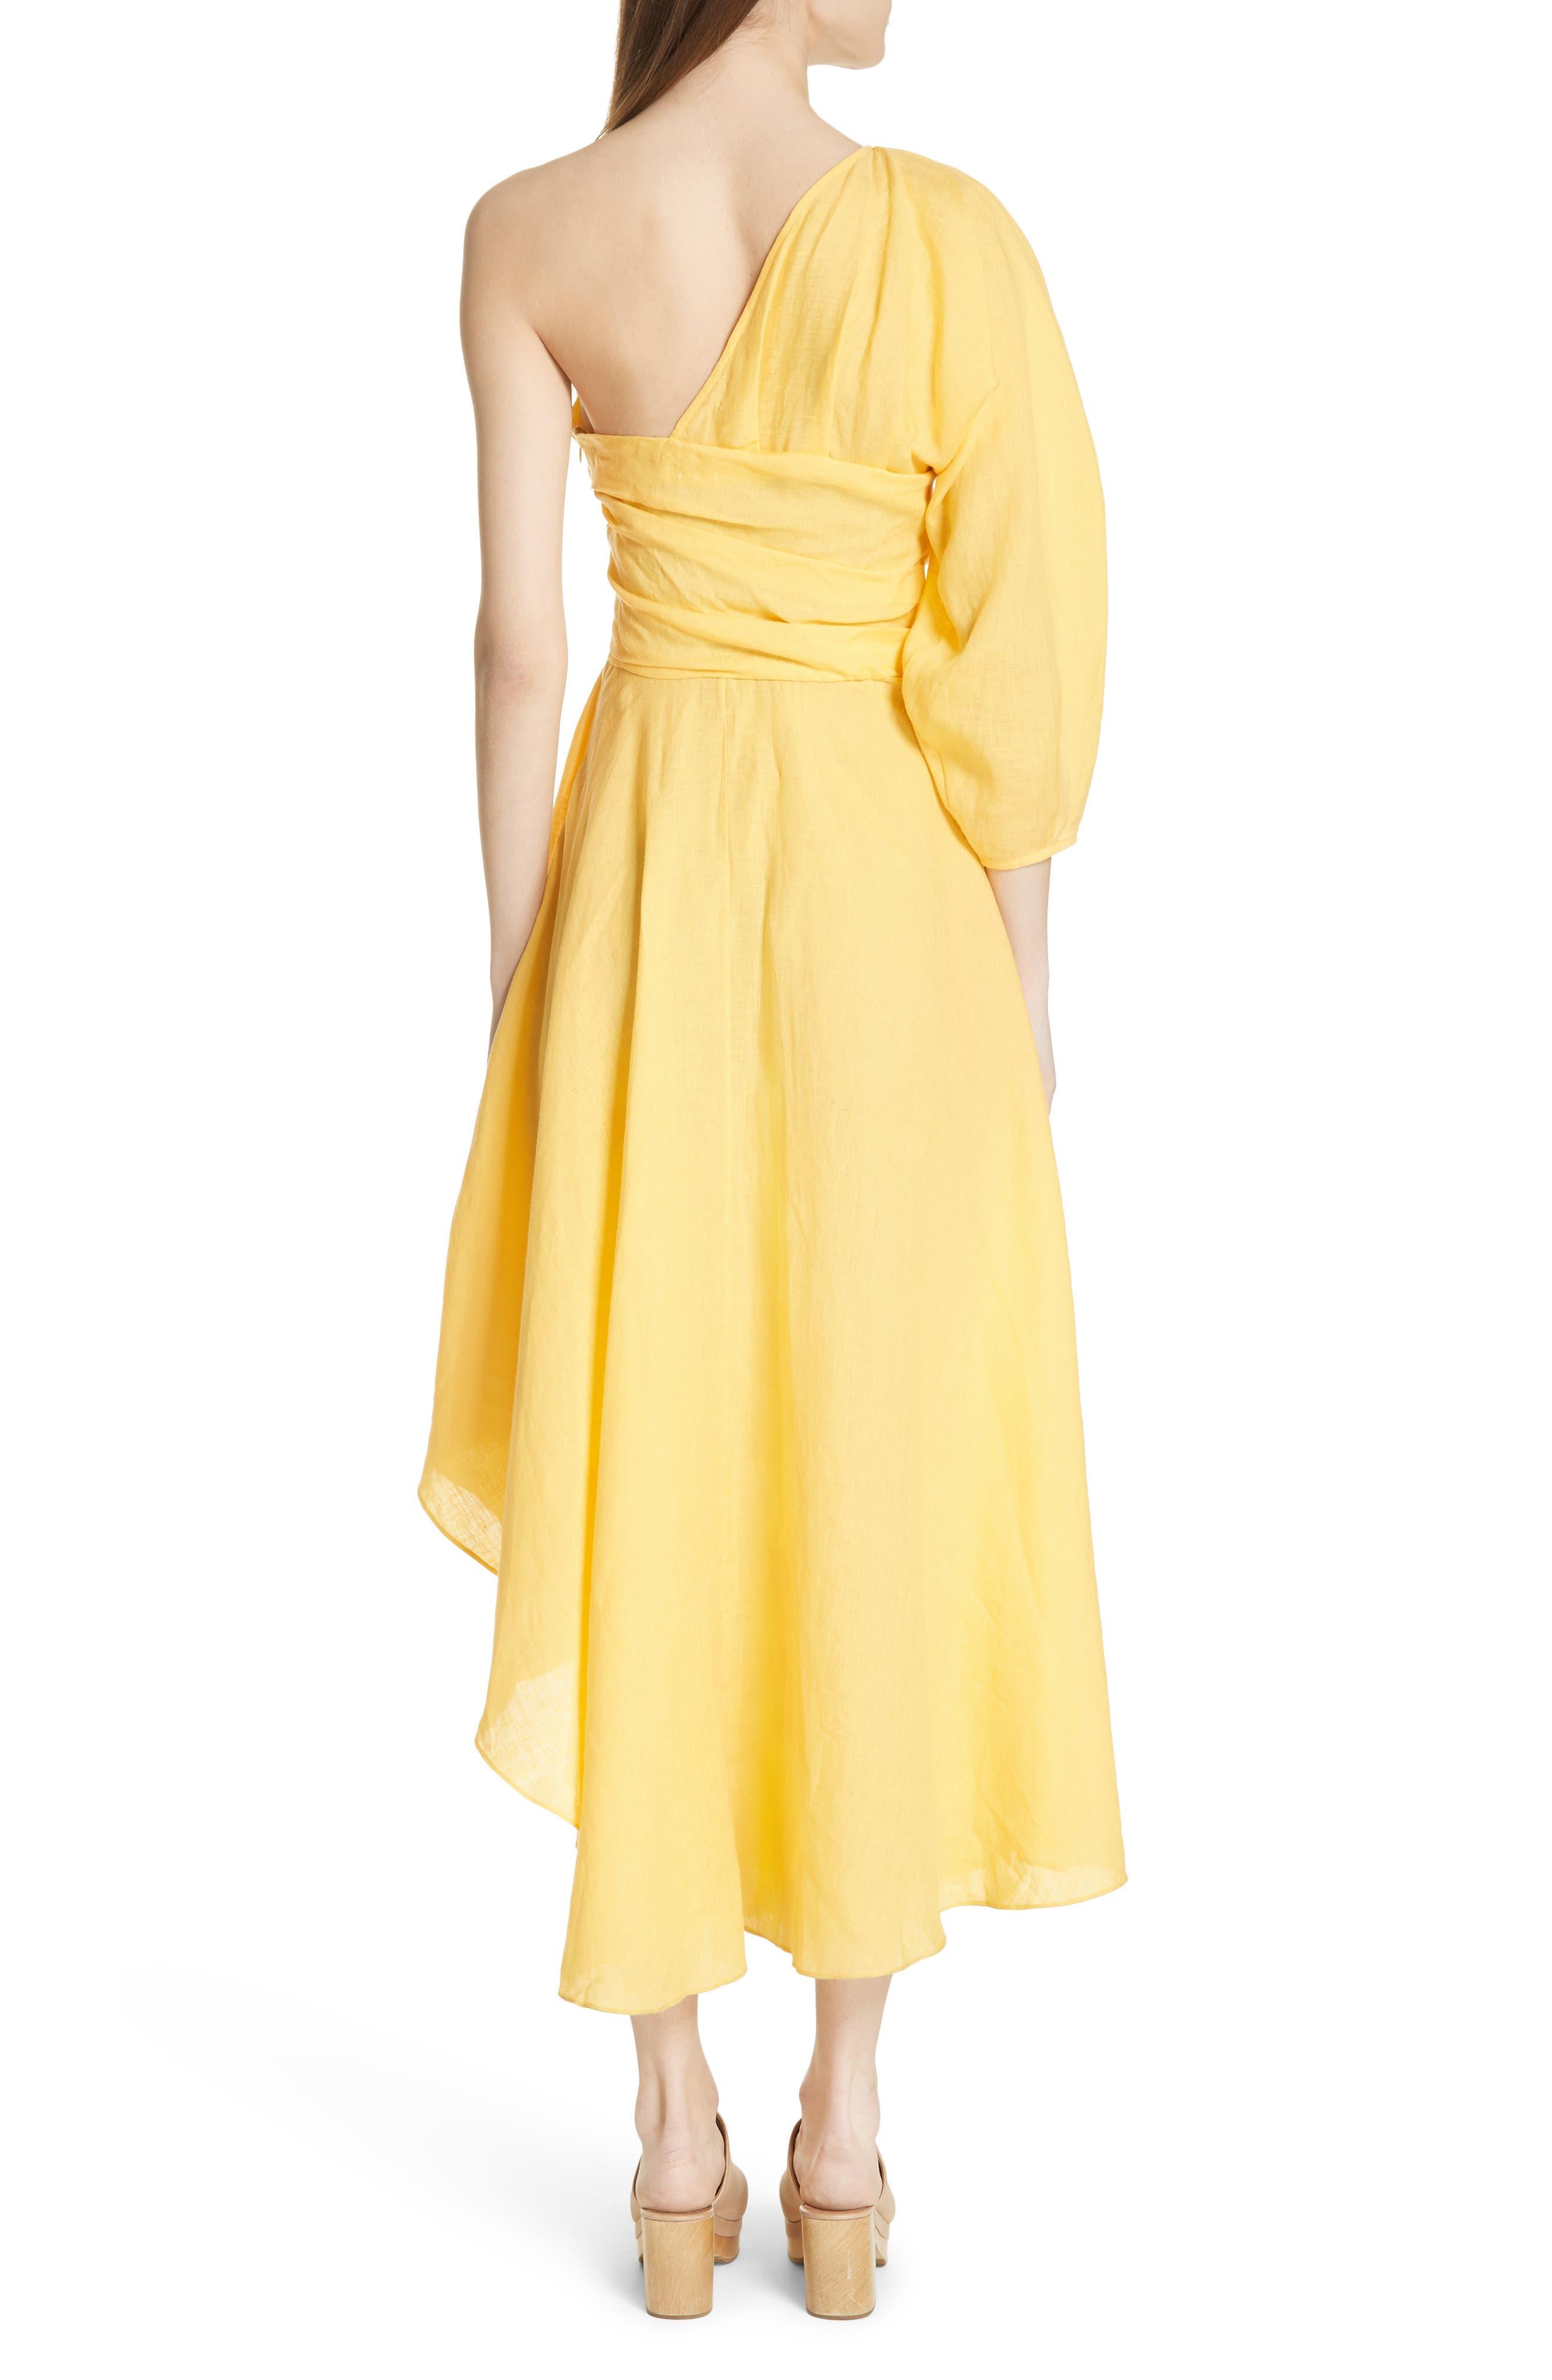 Tipple One-Shoulder Dress,                             Alternate thumbnail 2, color,                             770